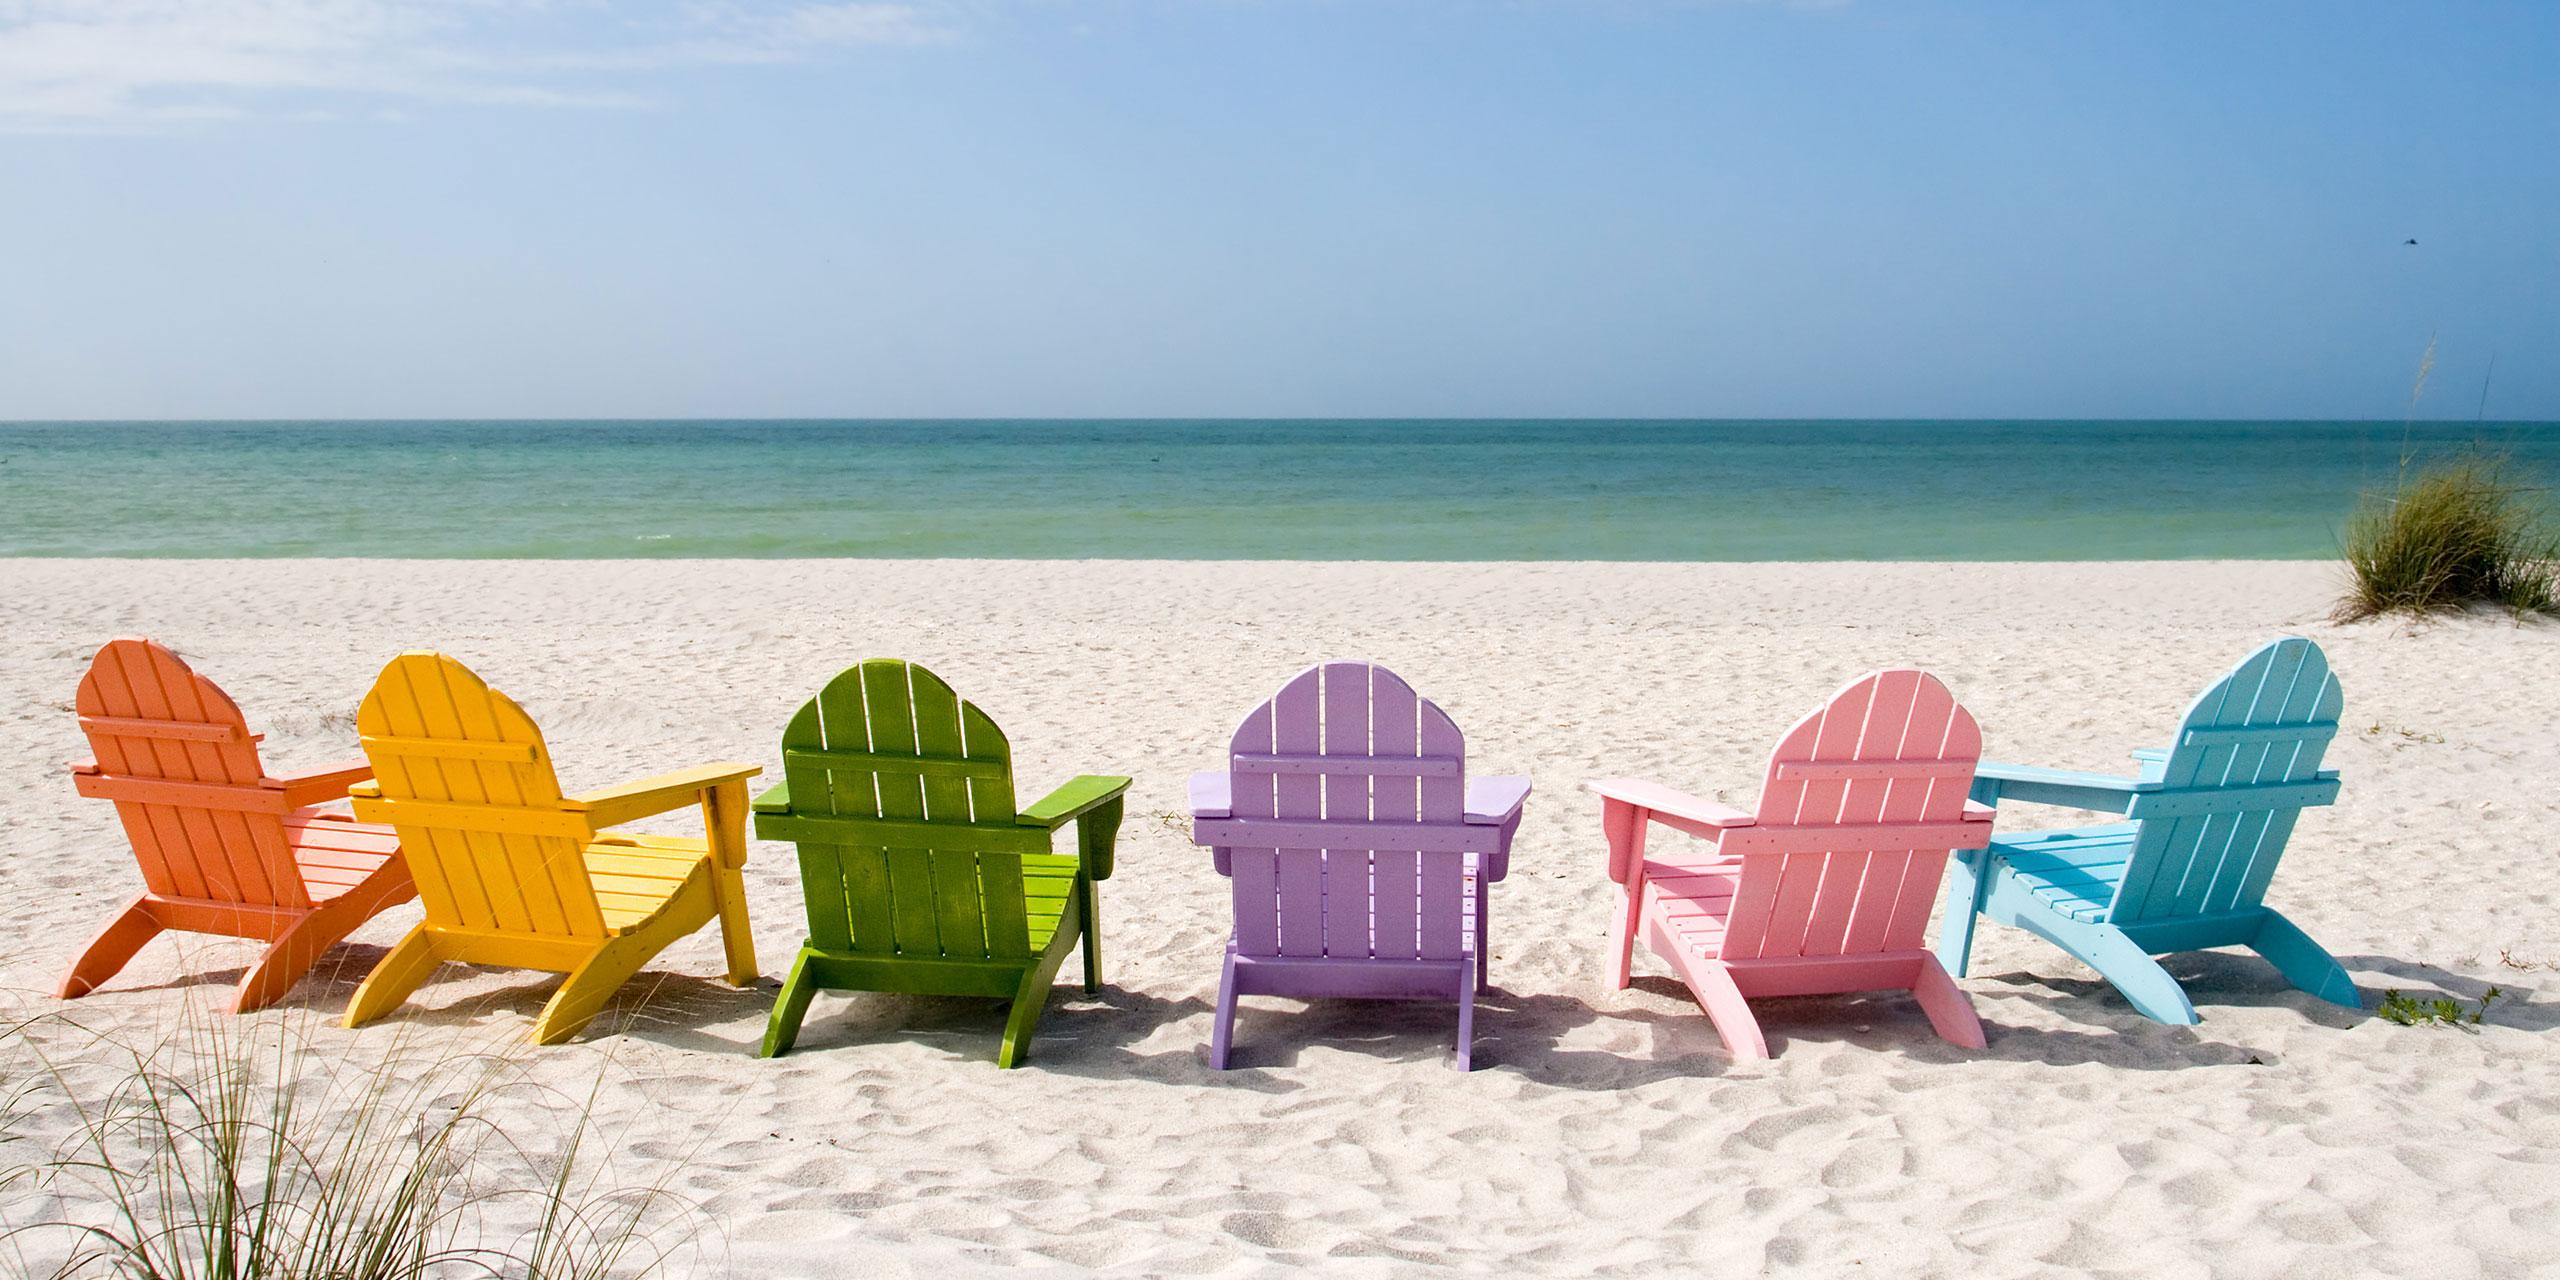 Captiva Beach, Florida; Courtesy of Chad McDermott/Shutterstock.com